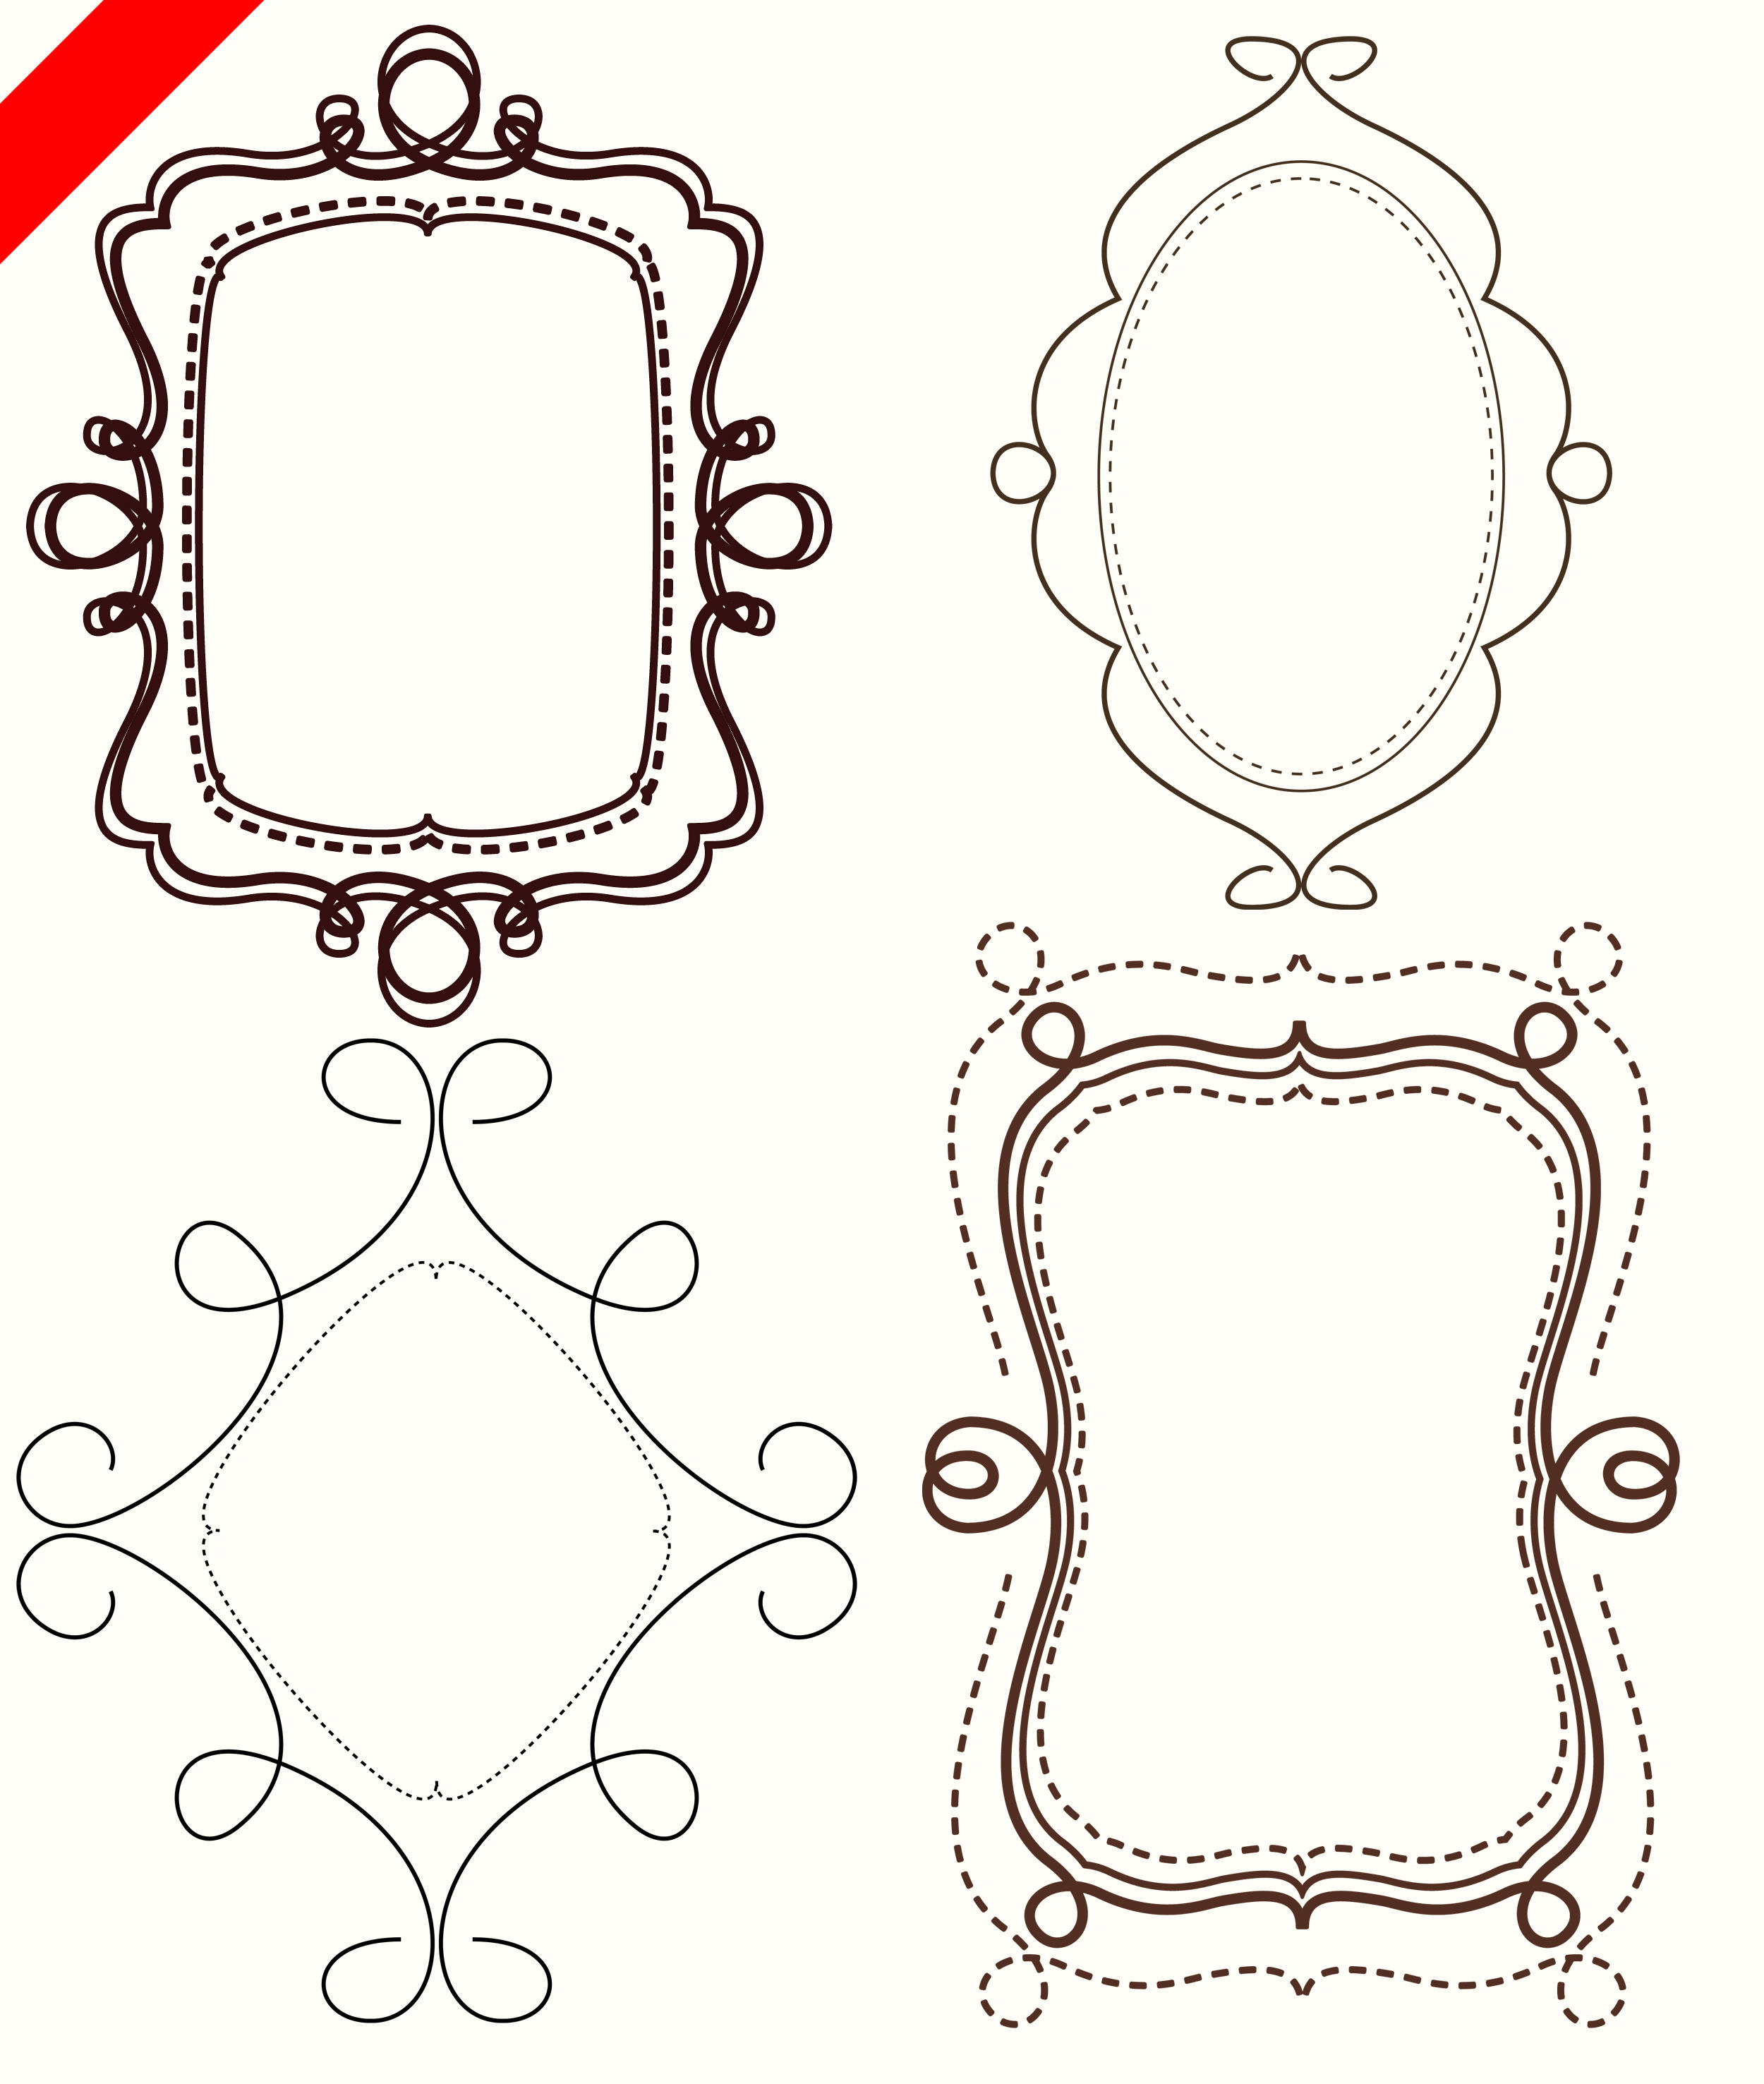 free printable clip art frames - photo #37